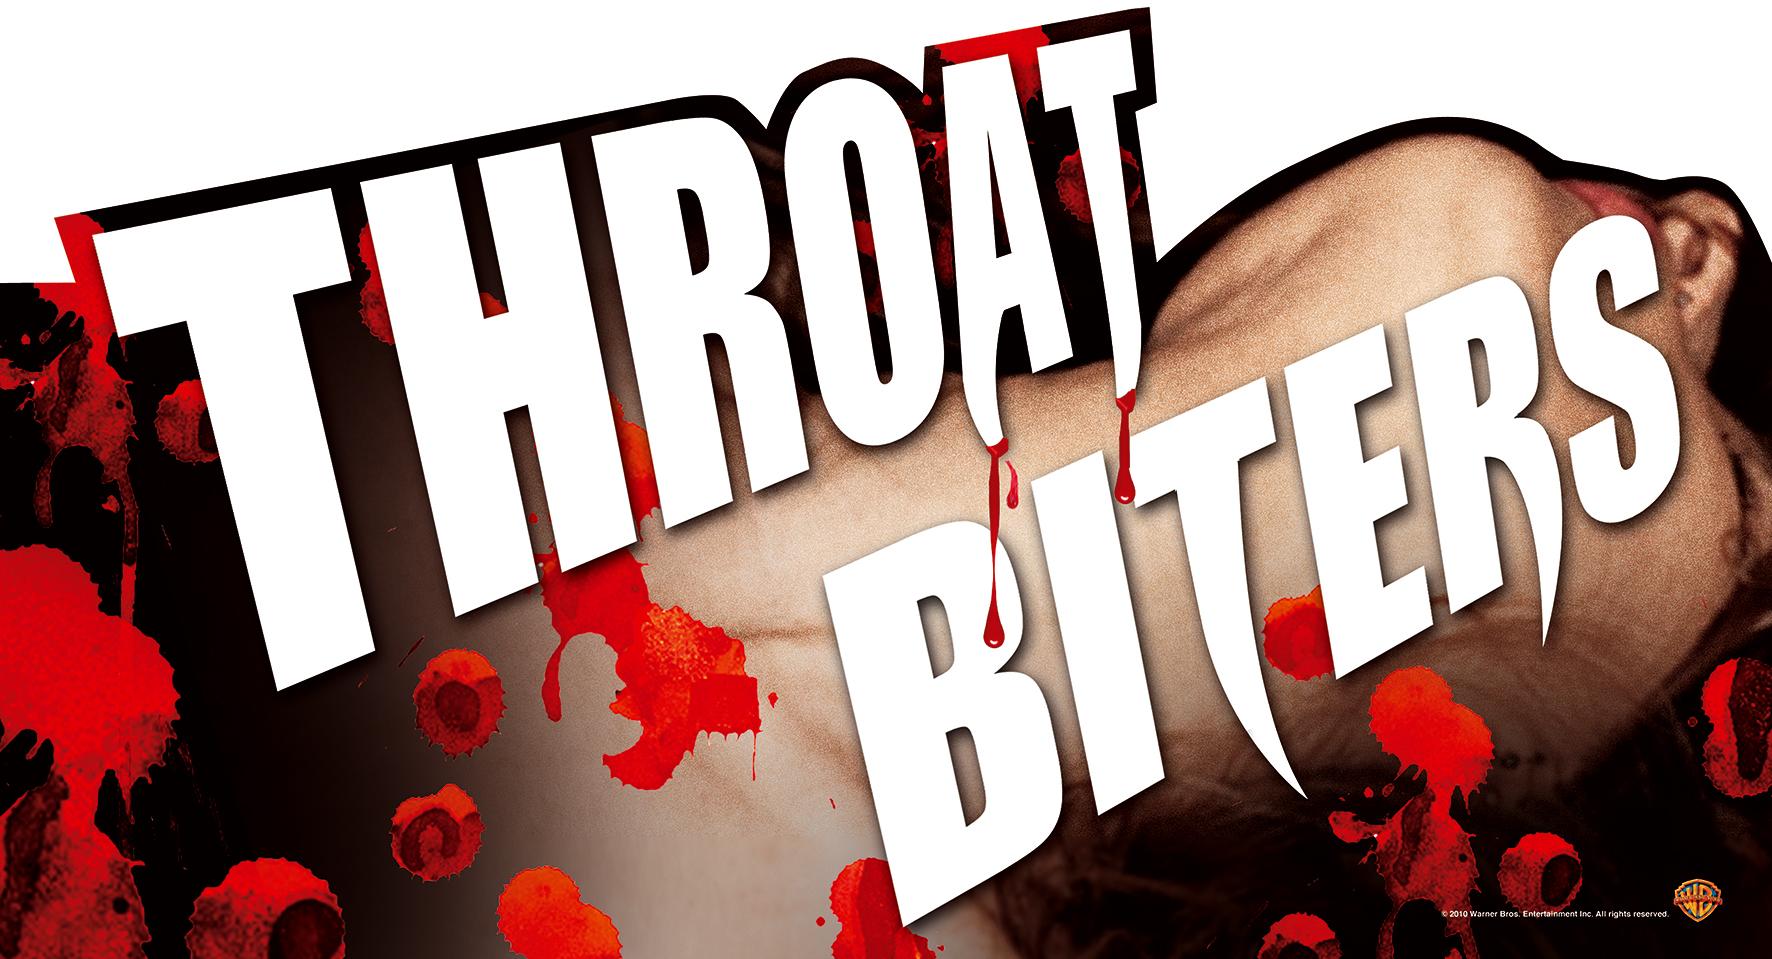 Throat Biters